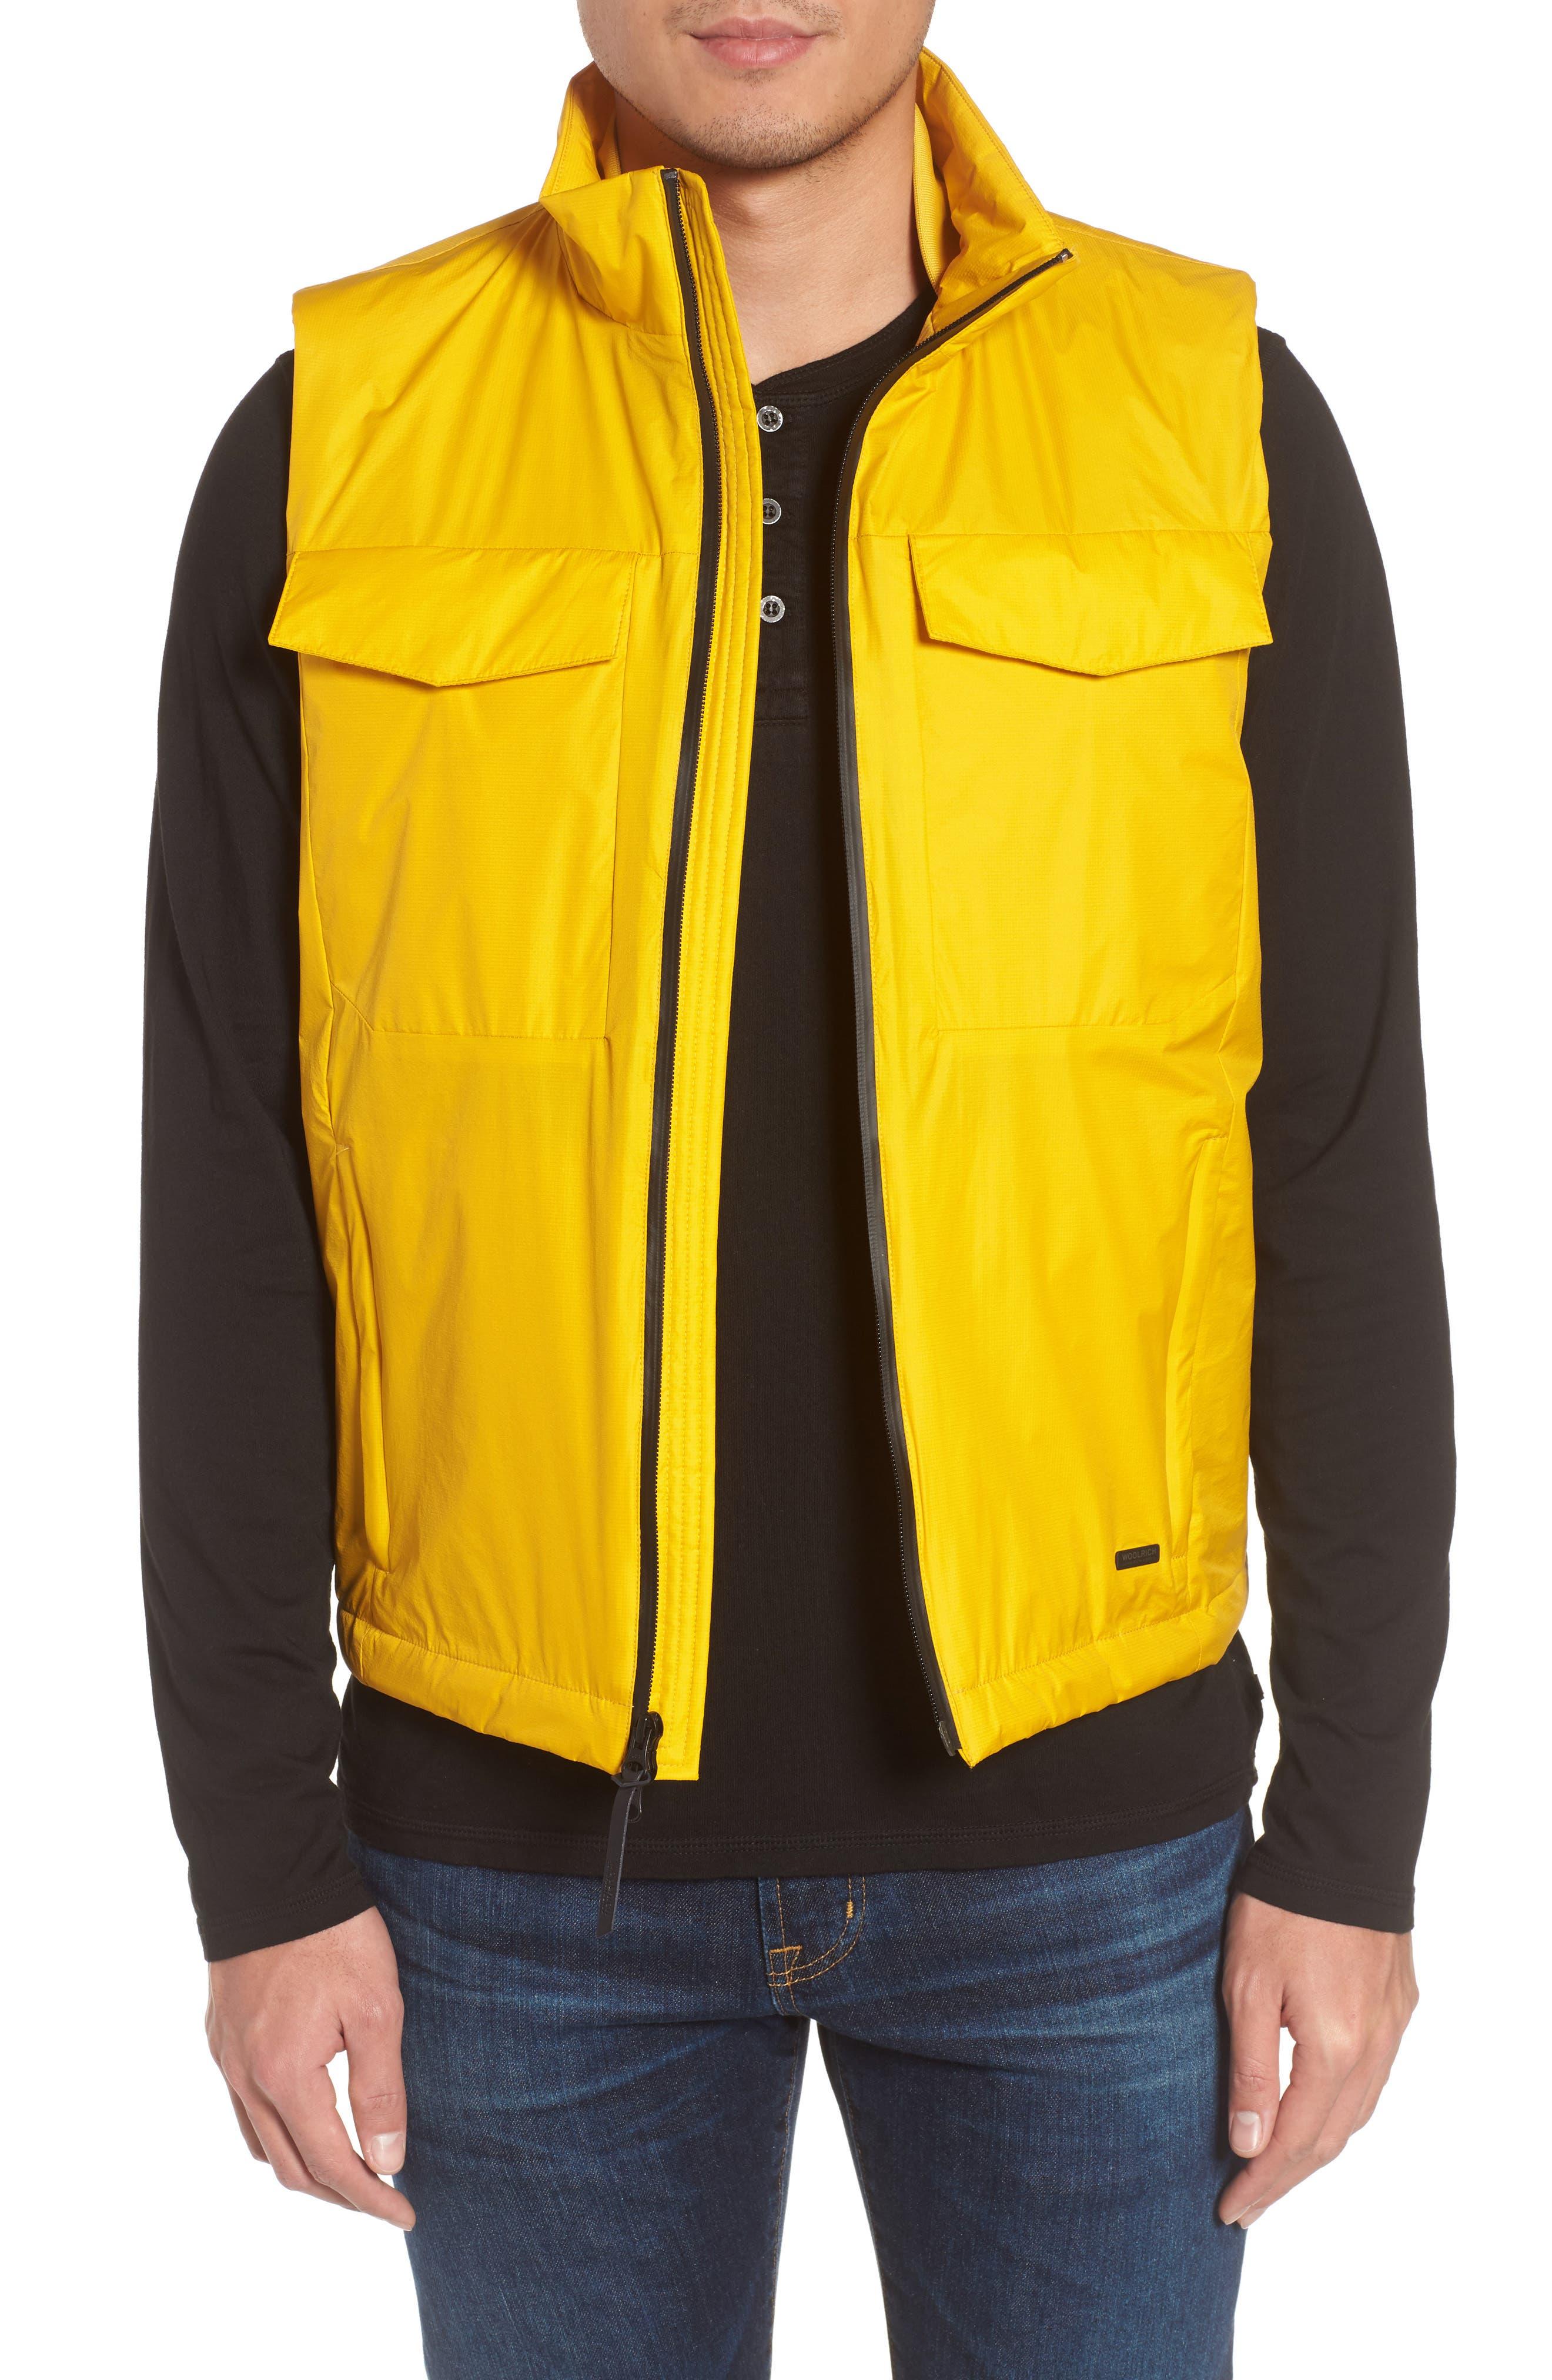 & Bros. Bering Vest,                             Main thumbnail 1, color,                             700